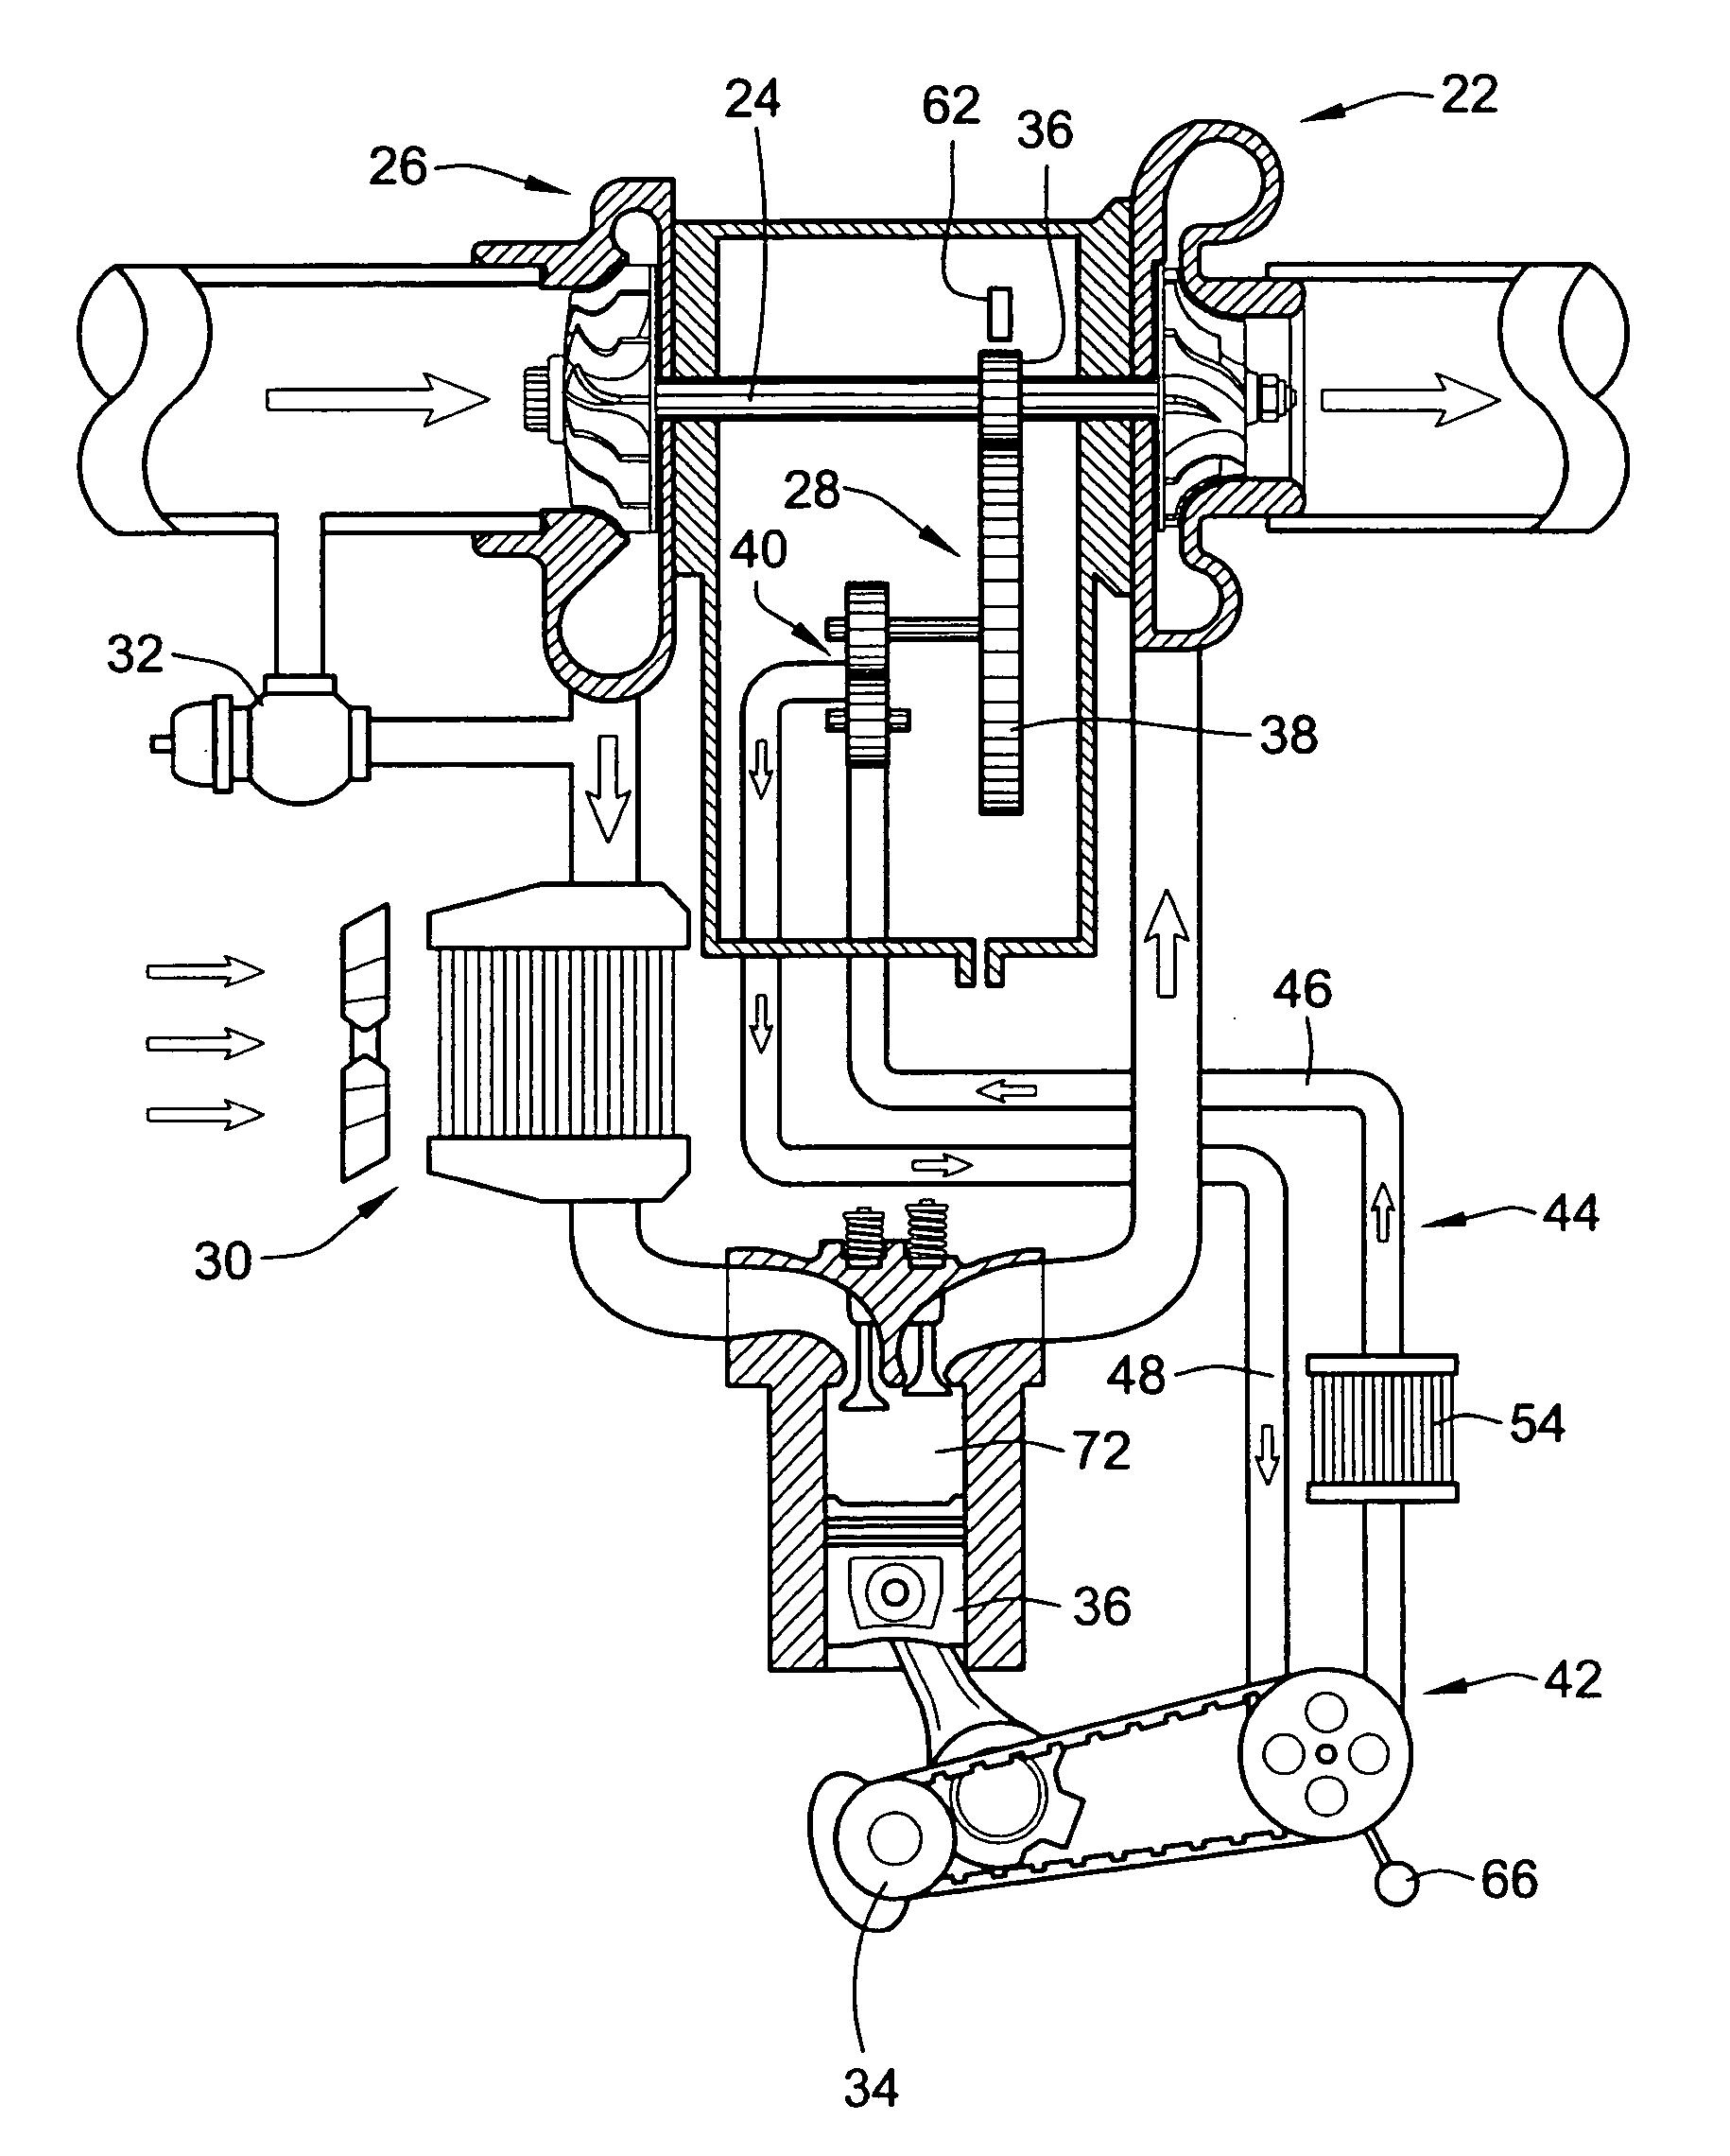 Wiring diagram bmw m40 also bmw 323ci engine diagram furthermore 325ci engine diagram furthermore 158671 additionally